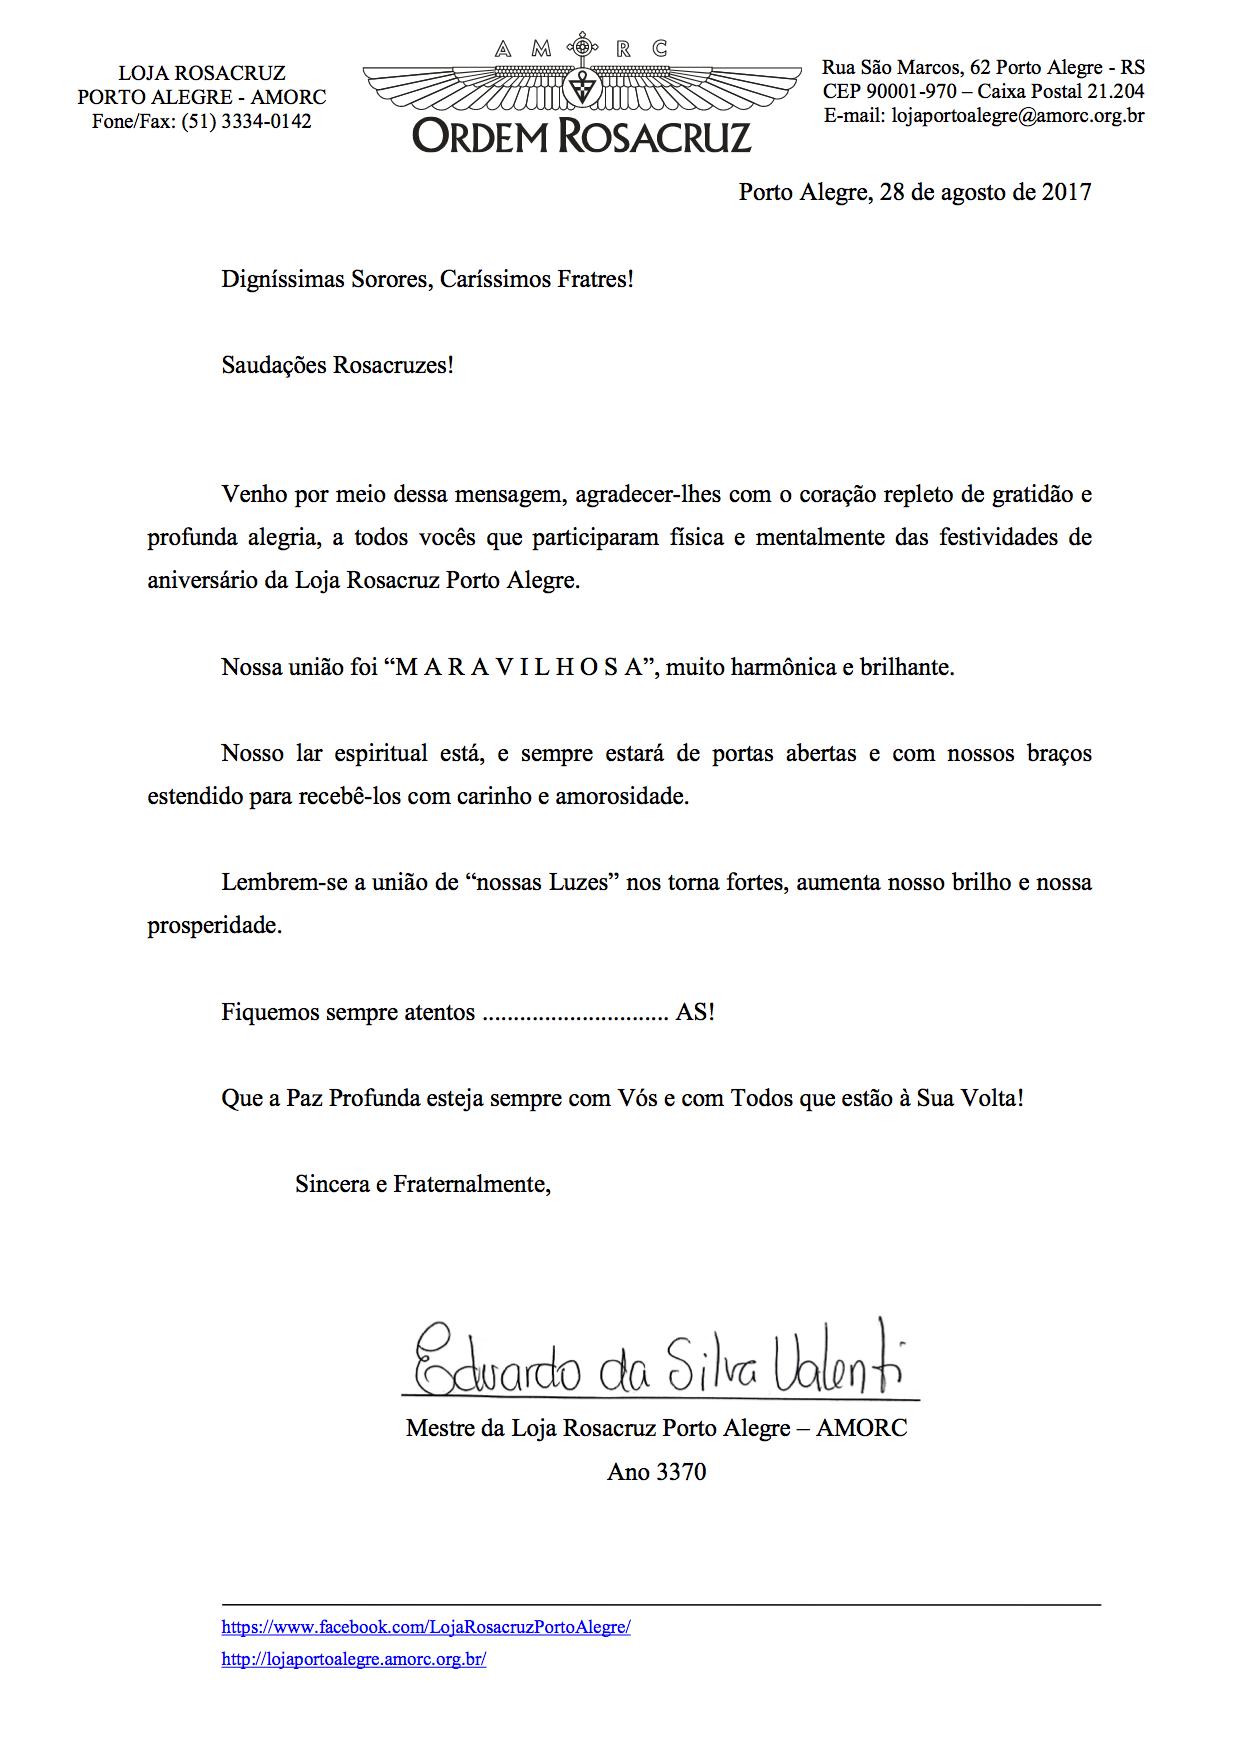 Carta Membros Porto Alegre Assinada